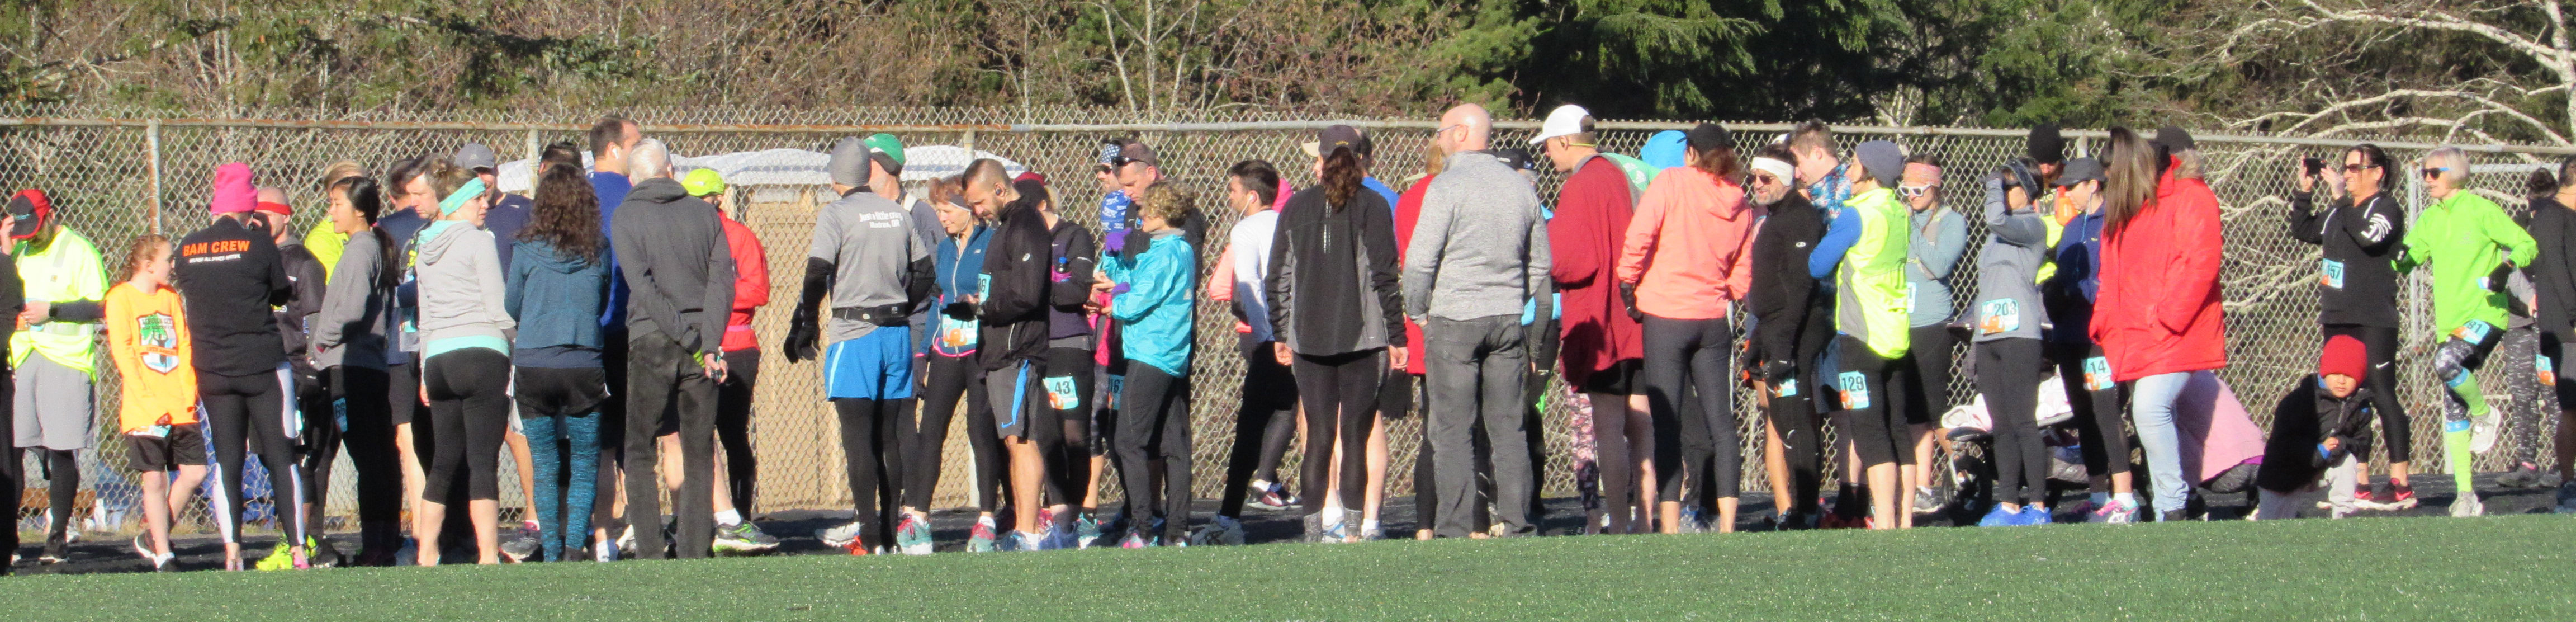 Lincoln City Half-marathon 10K